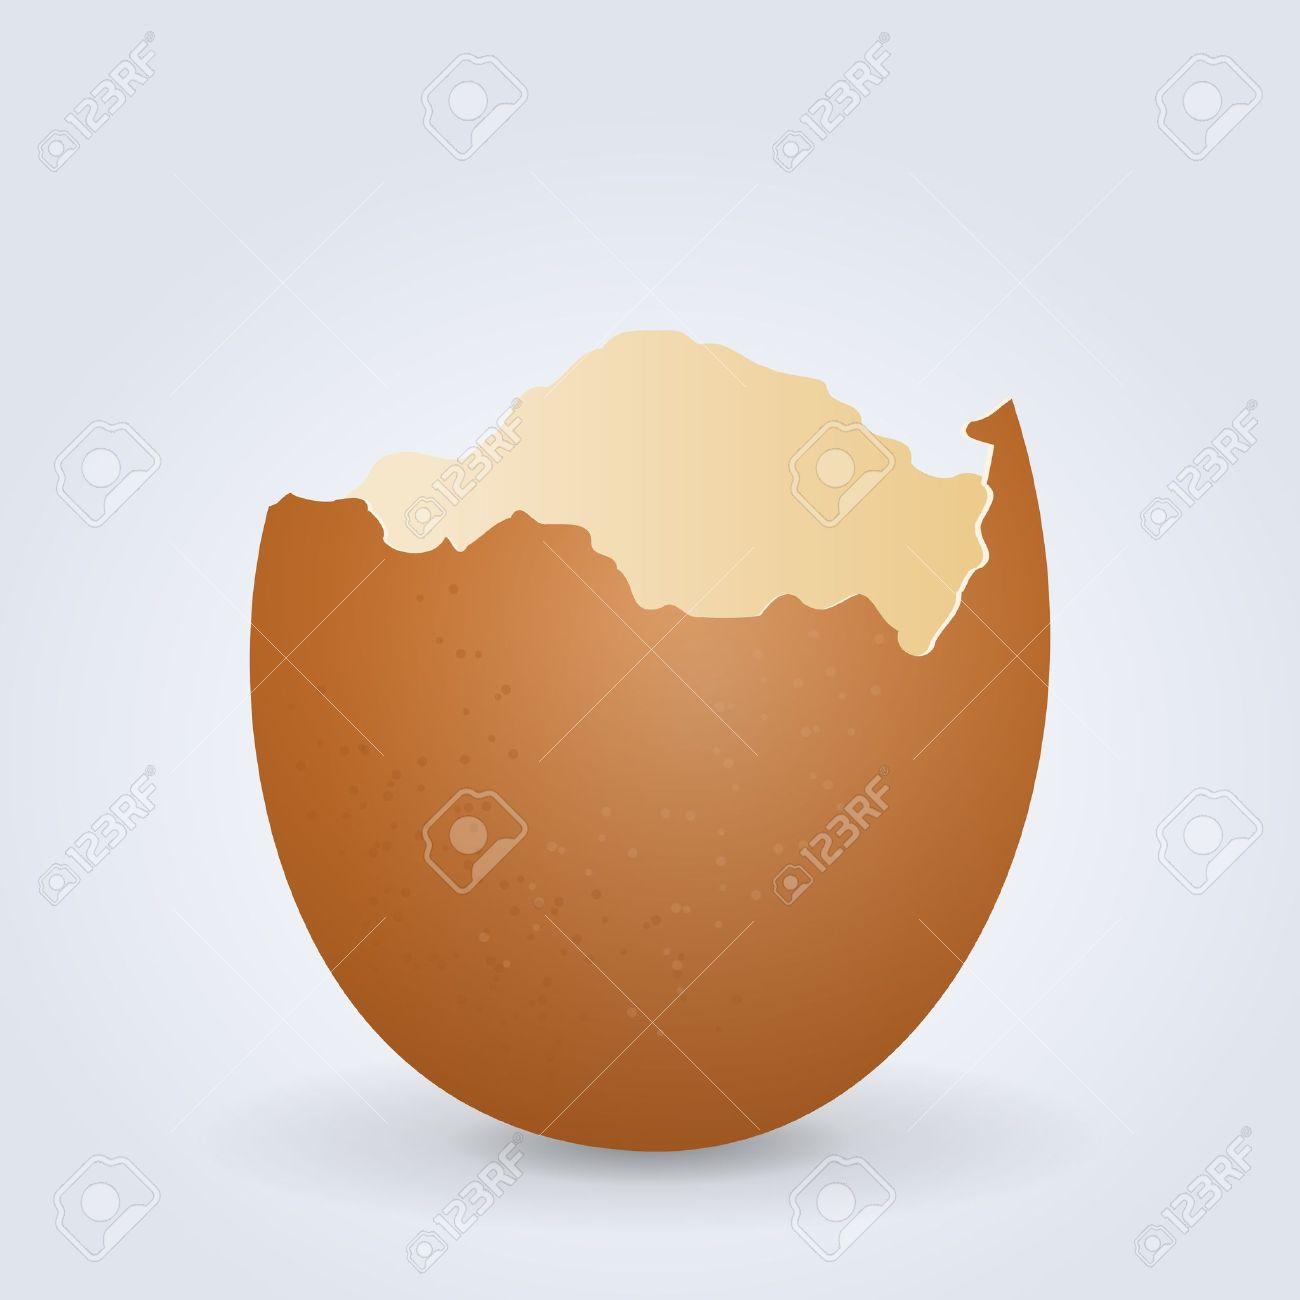 4,102 Eggshell Stock Vector Illustration And Royalty Free Eggshell.